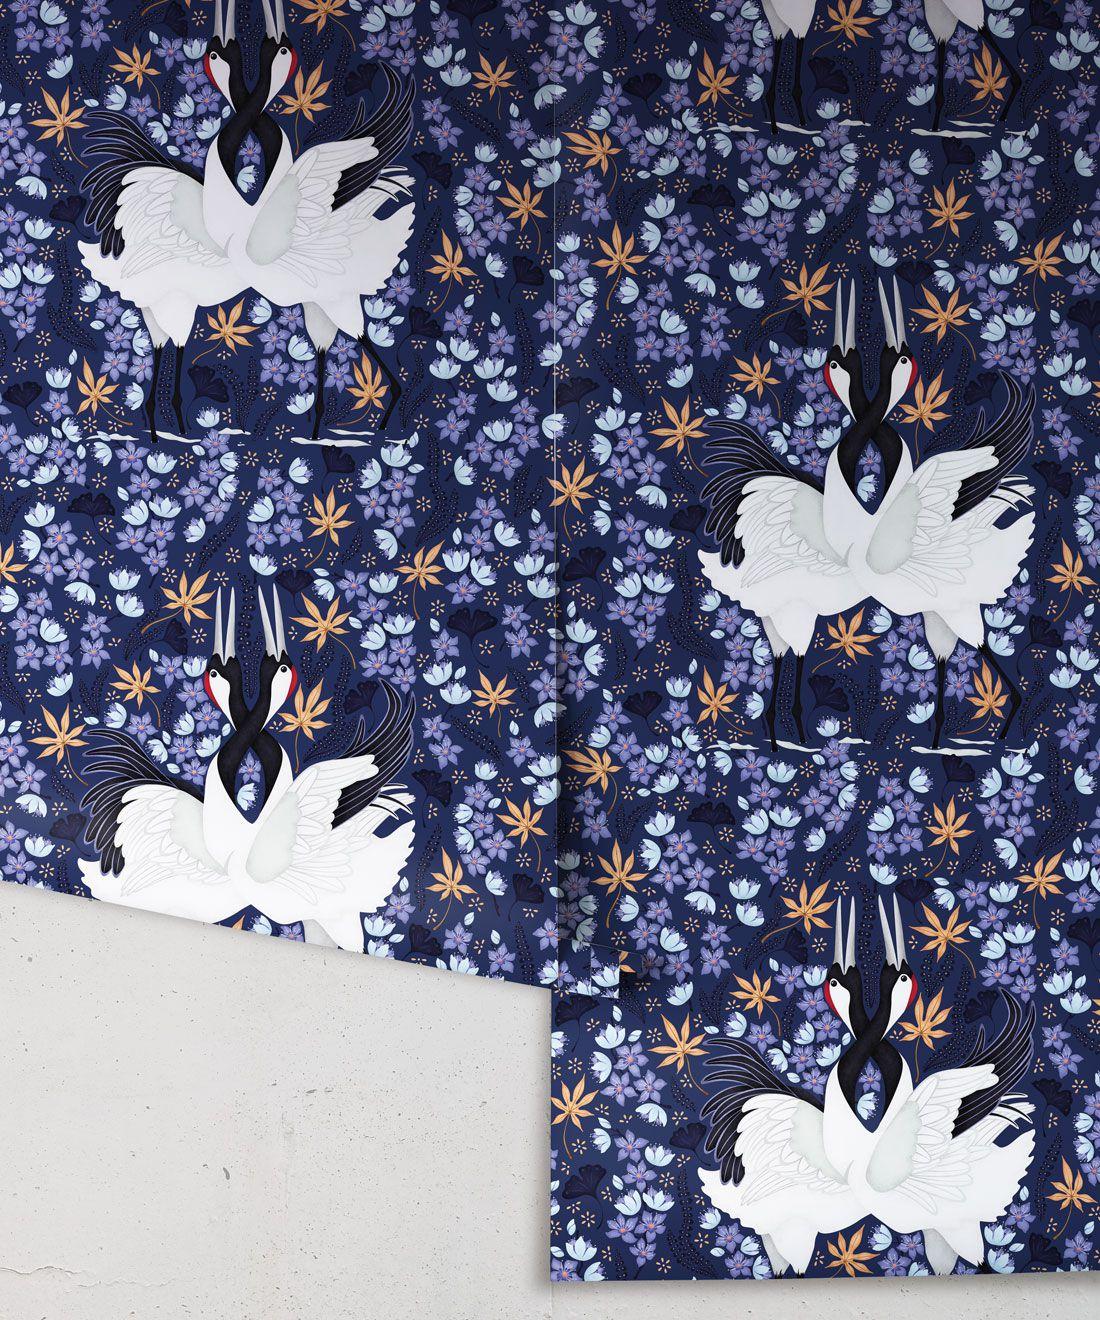 Japanese Cranes Wallpaper • Bird Wallpaper • Blue Wallpaper Drops